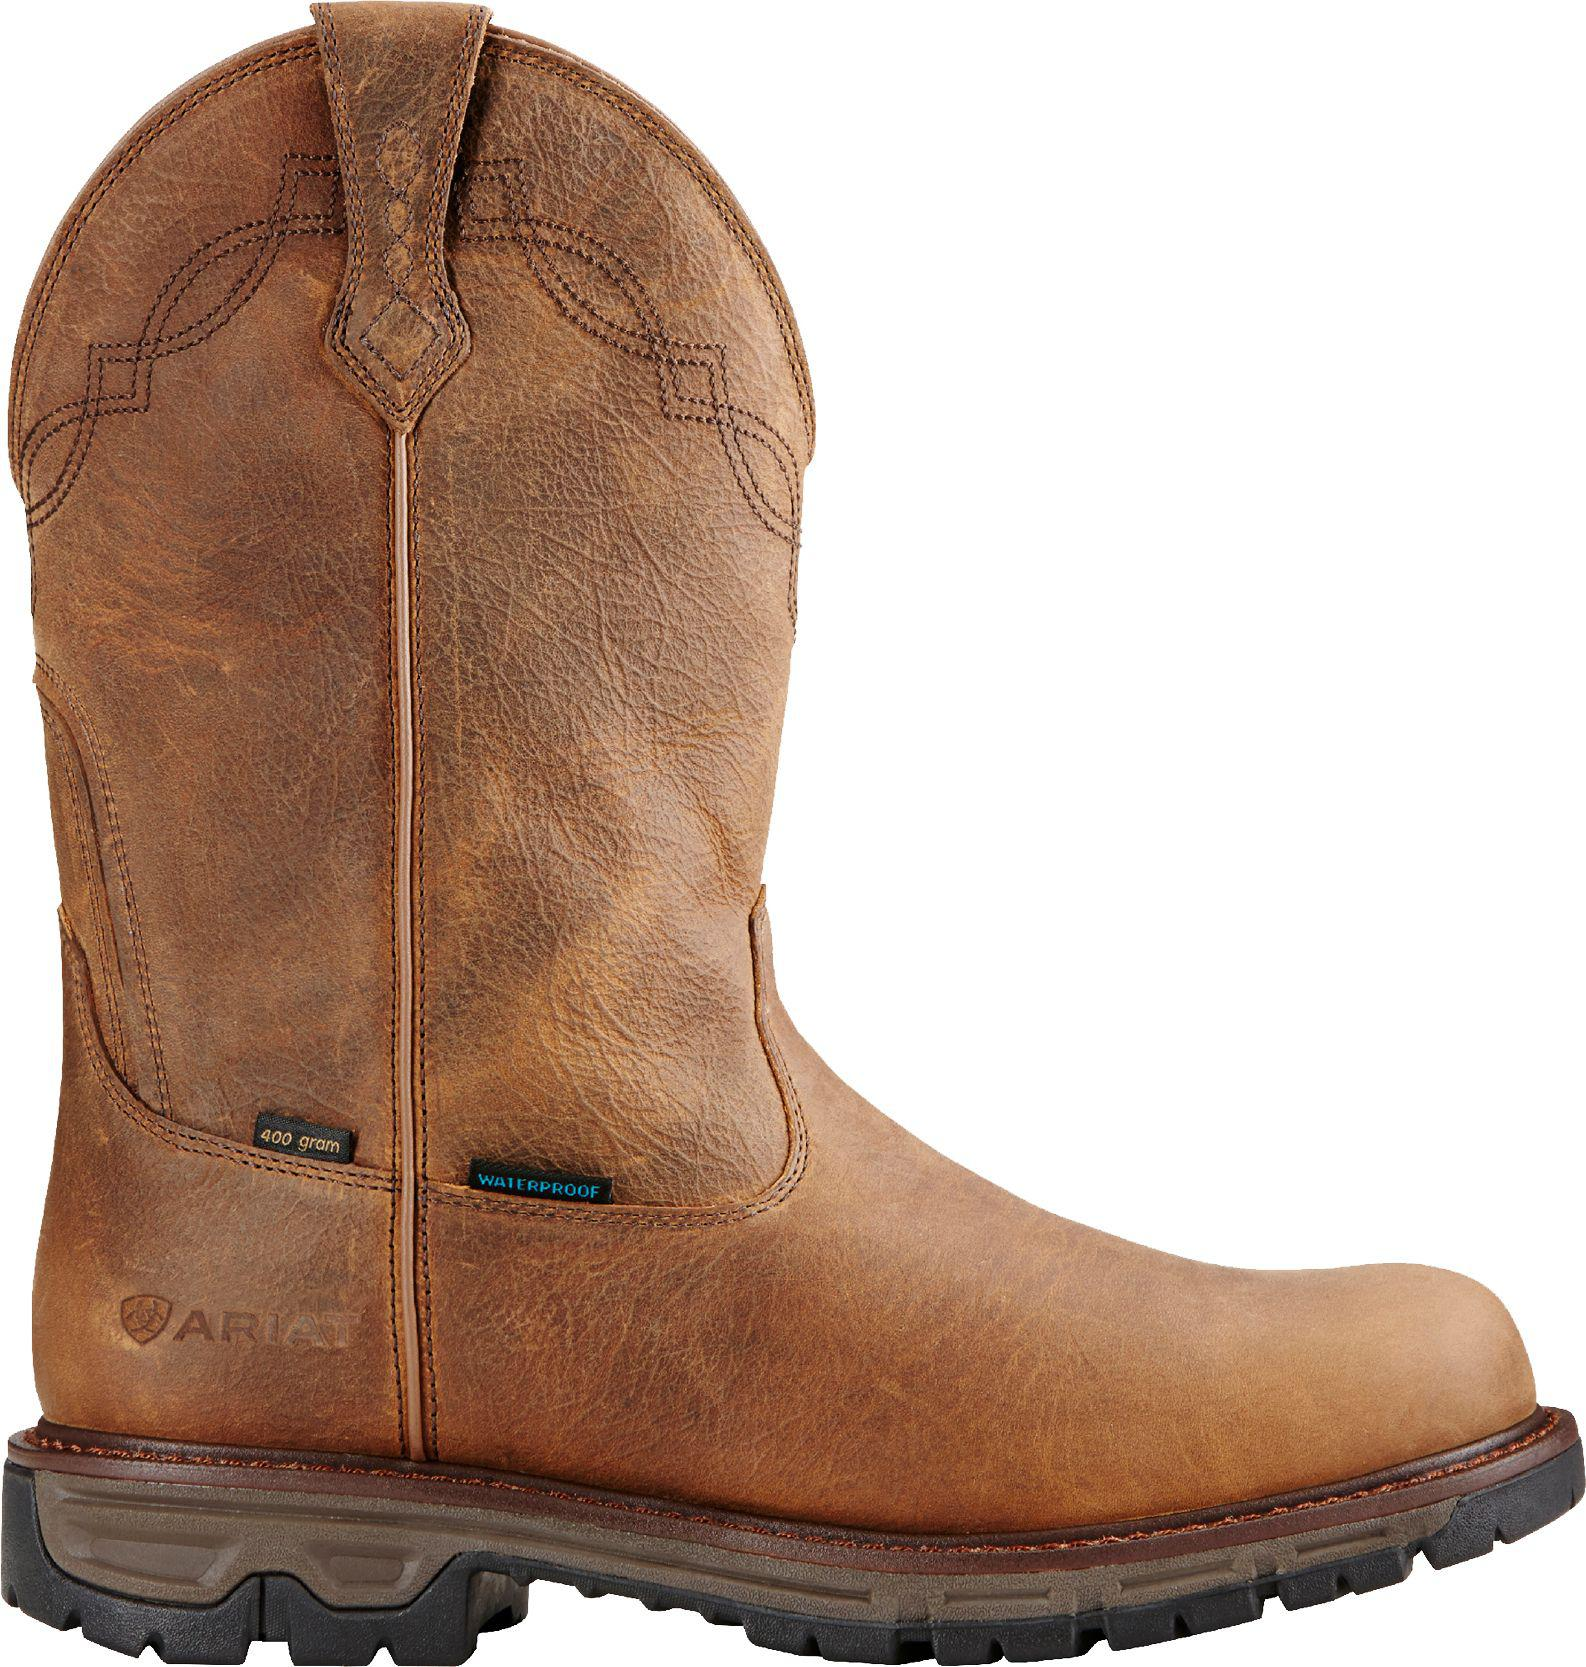 7f755cf0d3b Men's Brown Conquest 400g Waterproof Work Boots